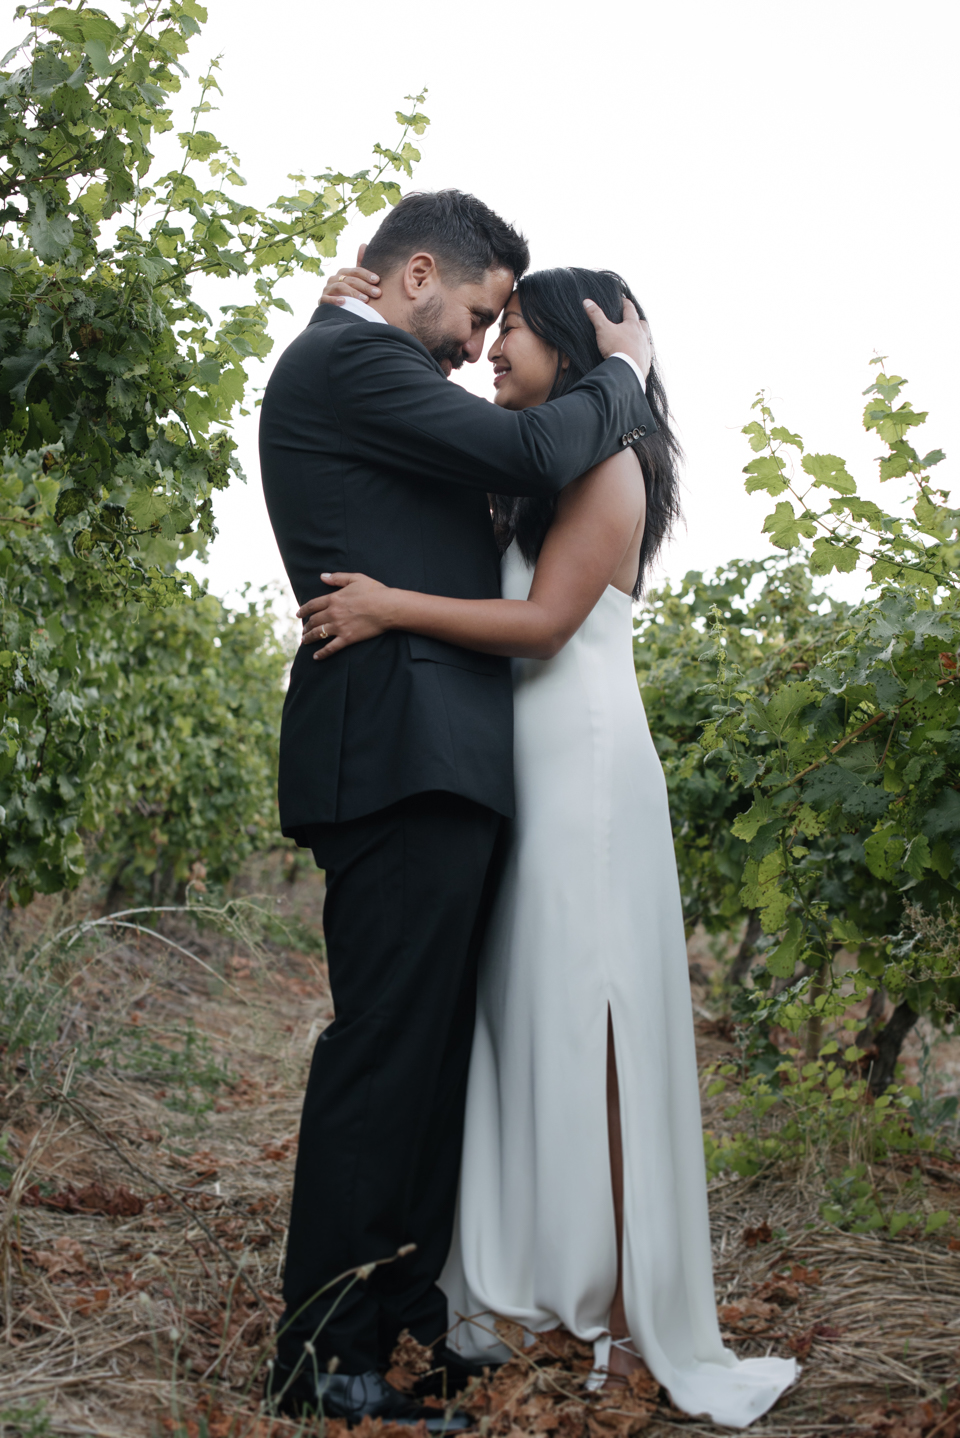 Grace and Alfonso wedding Clouds Estate Stellenbosch South Africa shot by dna photographers 742.jpg